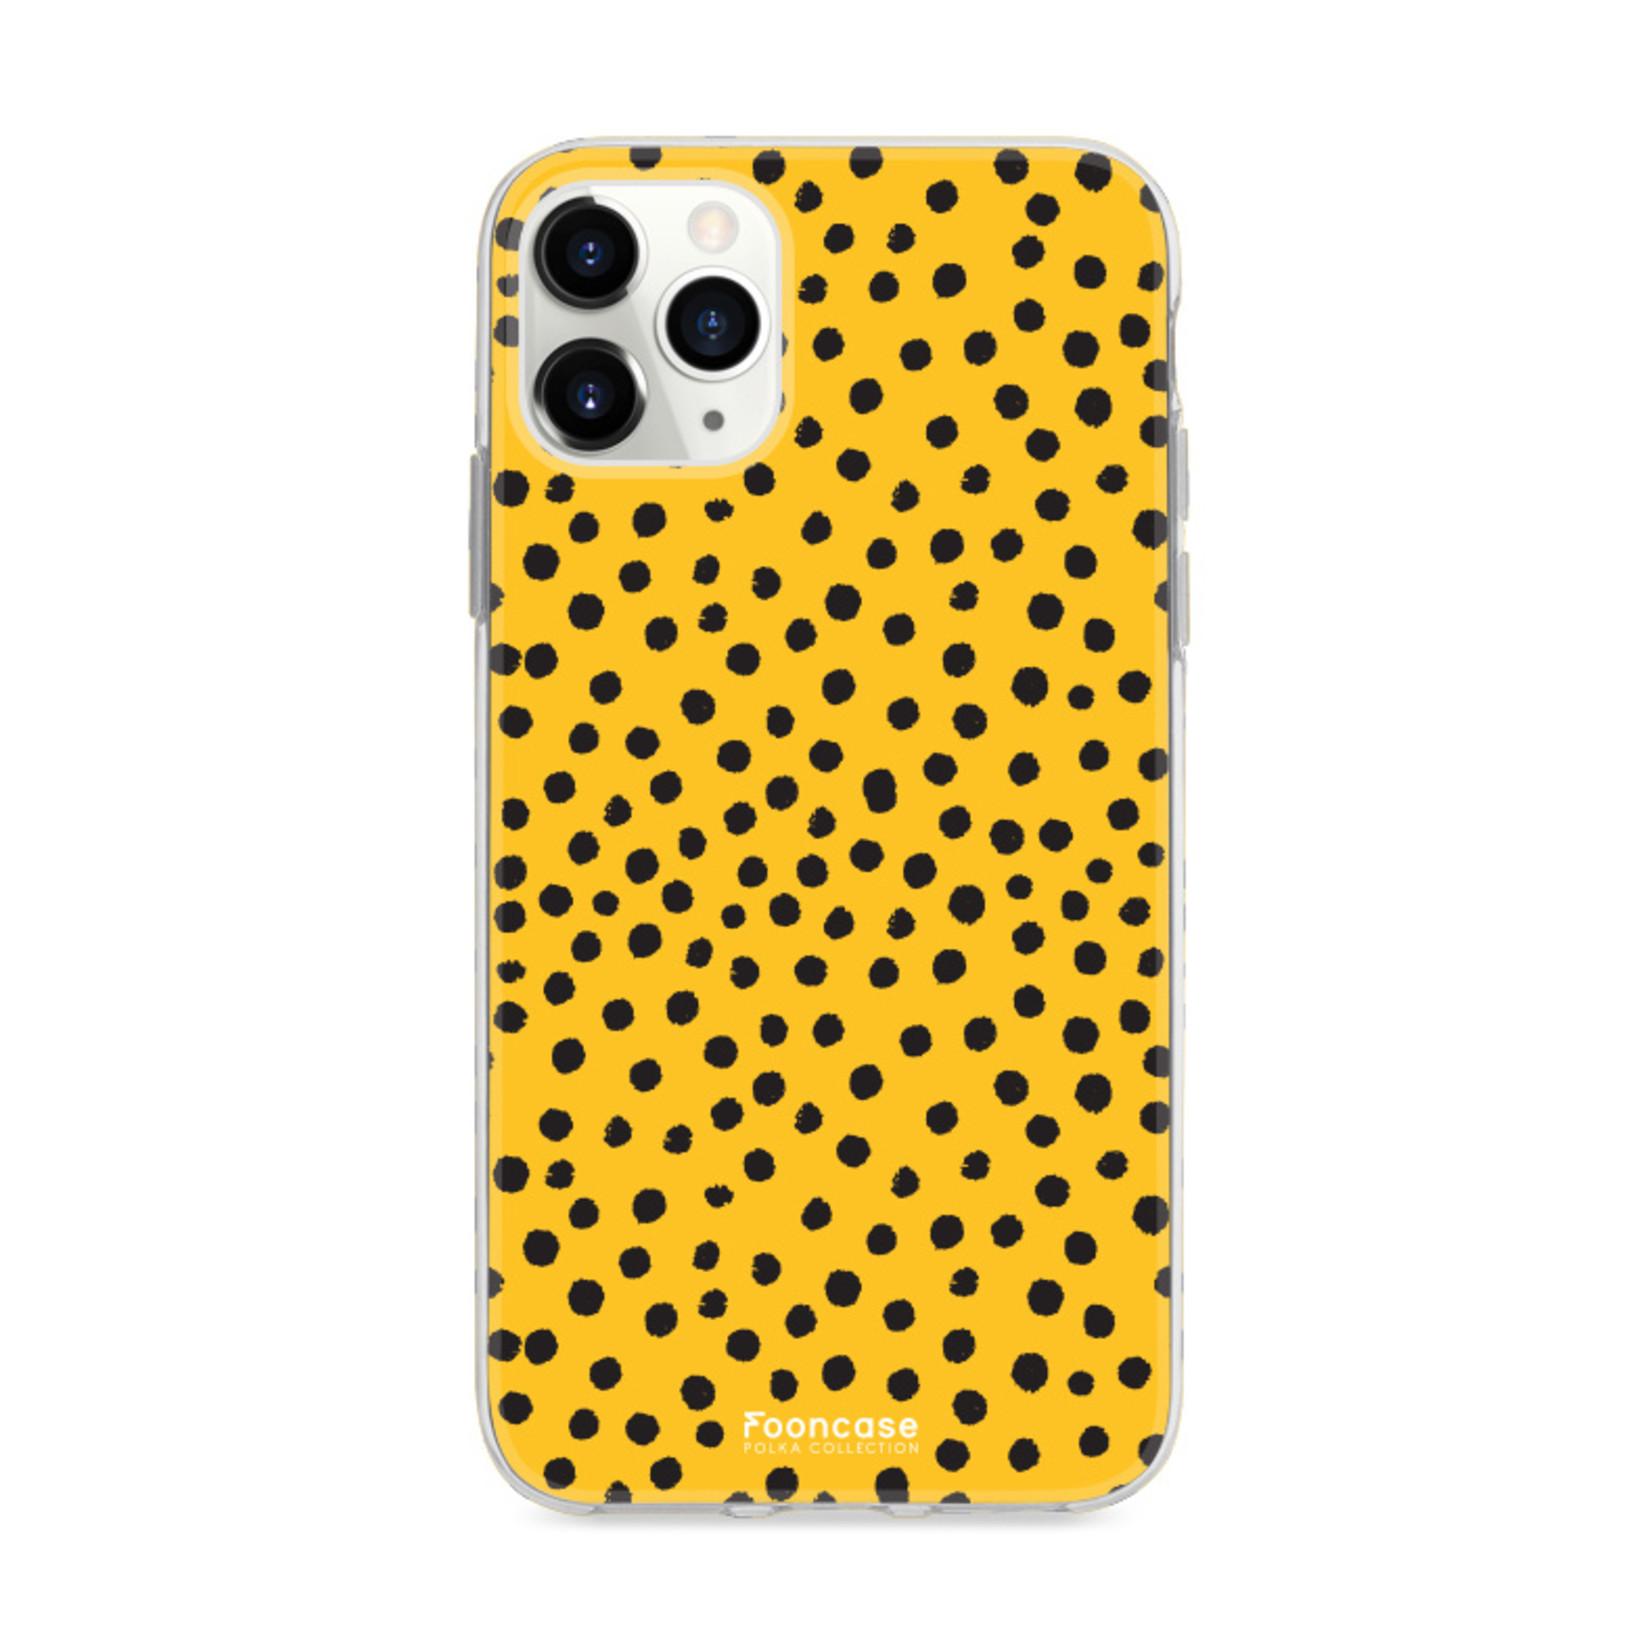 FOONCASE iPhone 11 Pro hoesje TPU Soft Case - Back Cover - POLKA COLLECTION / Stipjes / Stippen / Oker Geel